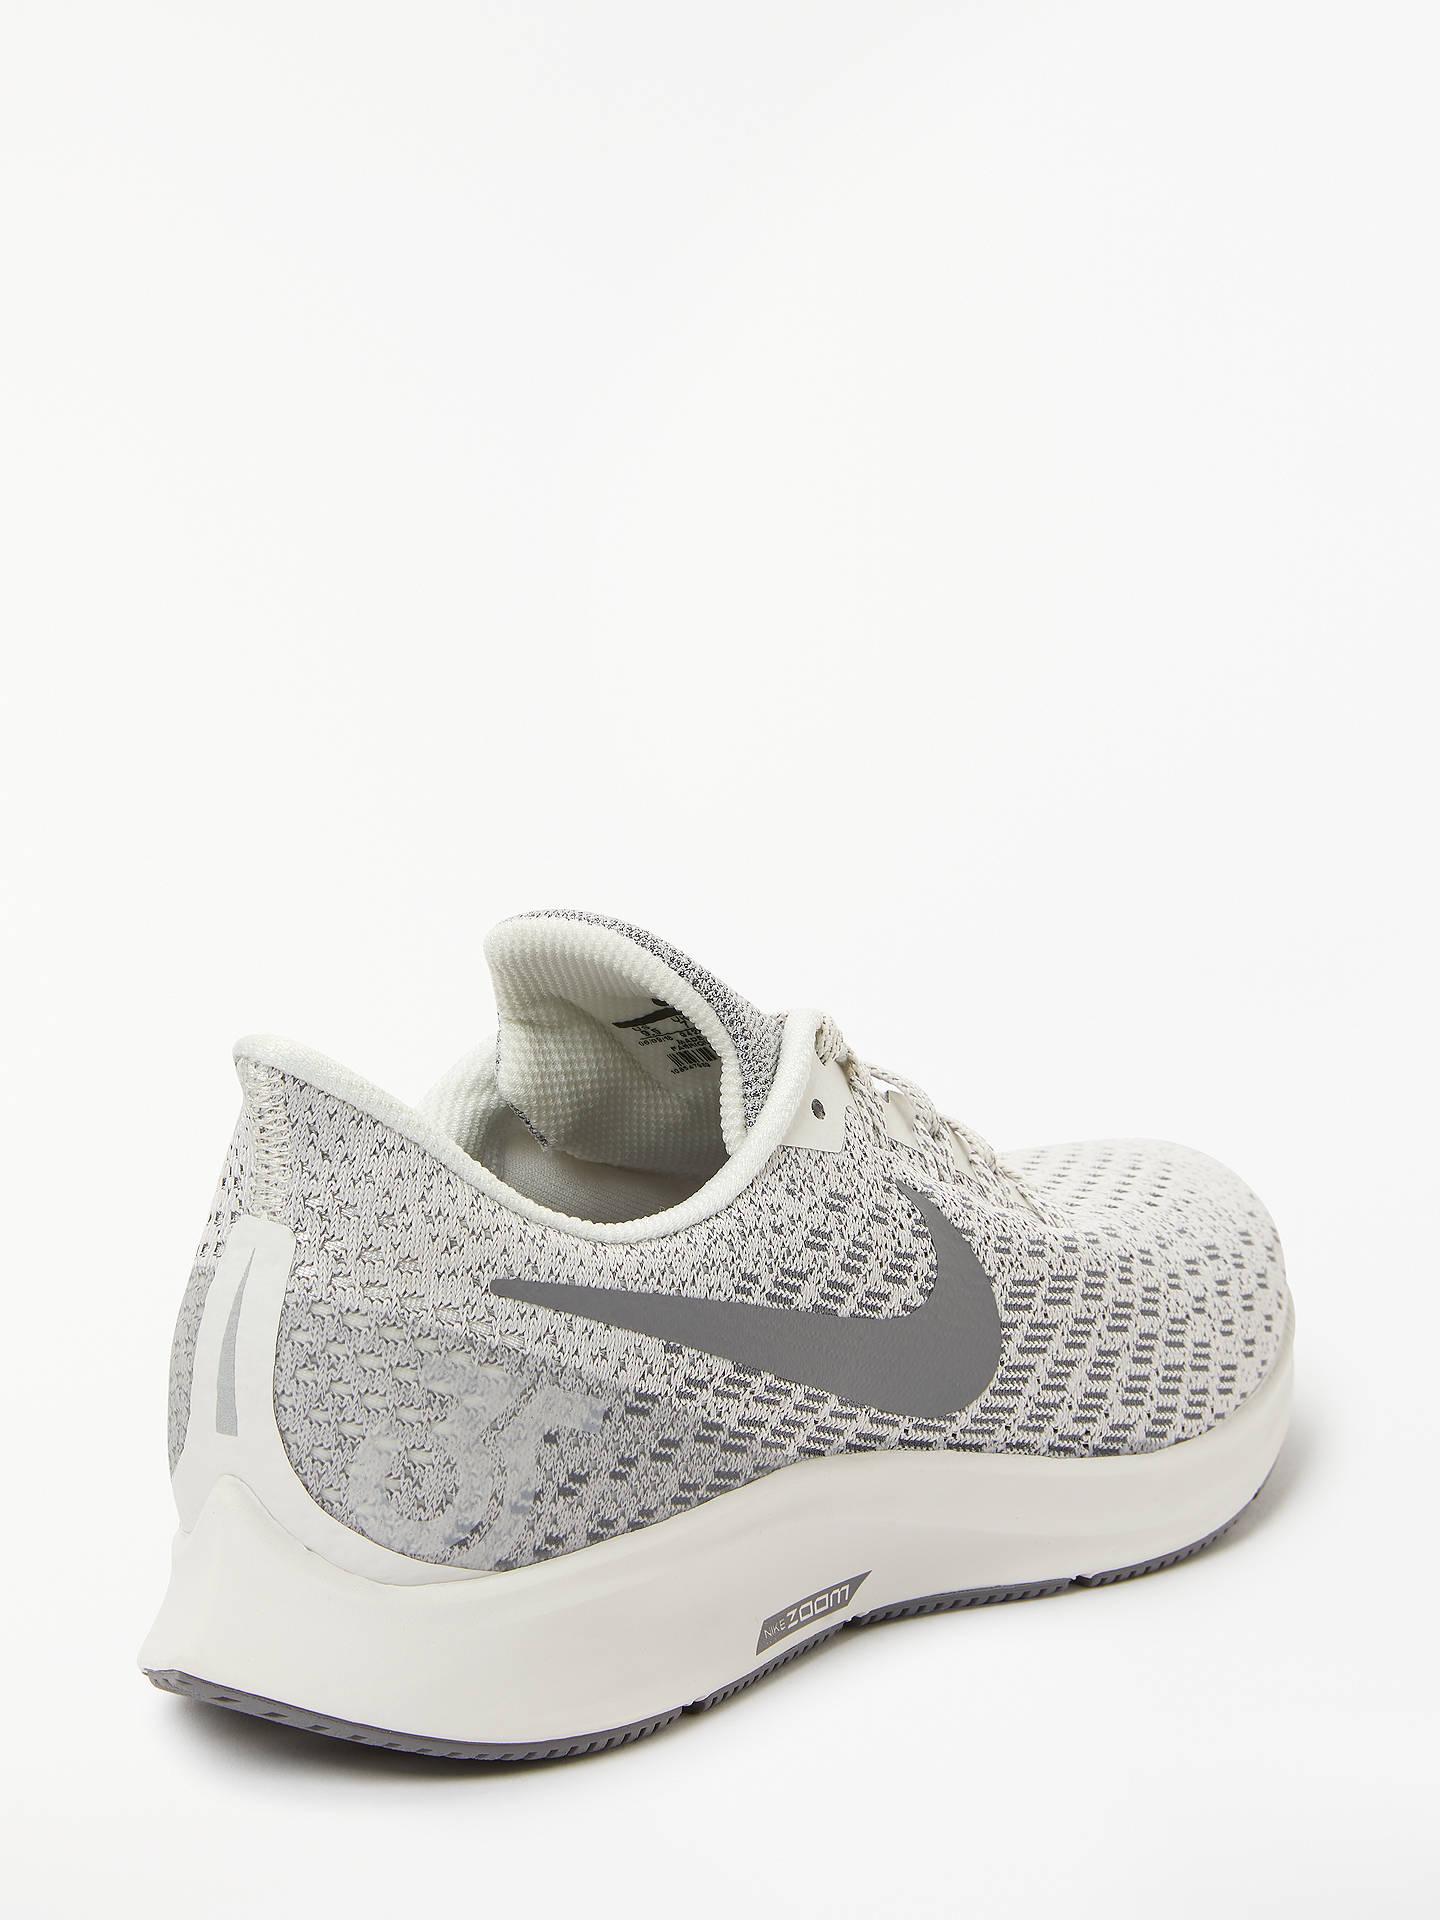 5cb2a860aec ... Buy Nike Air Zoom Pegasus 35 Women s Running Shoes